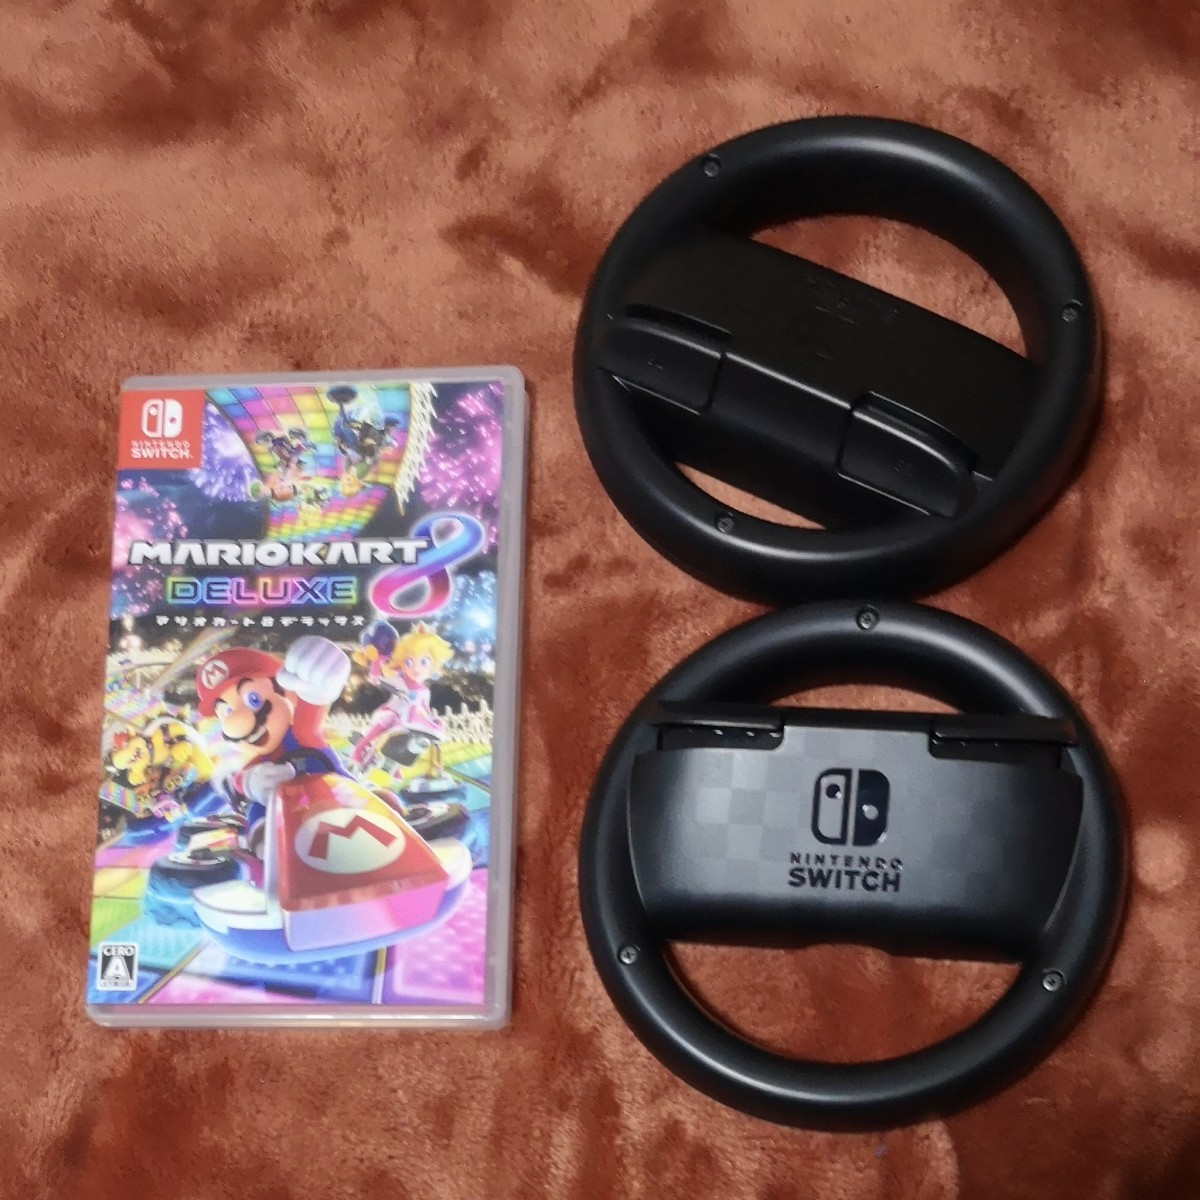 【Switch】 マリオカート8 デラックス Joy-Conハンドル ジョイコンハンドル Nintendo Switchソフト